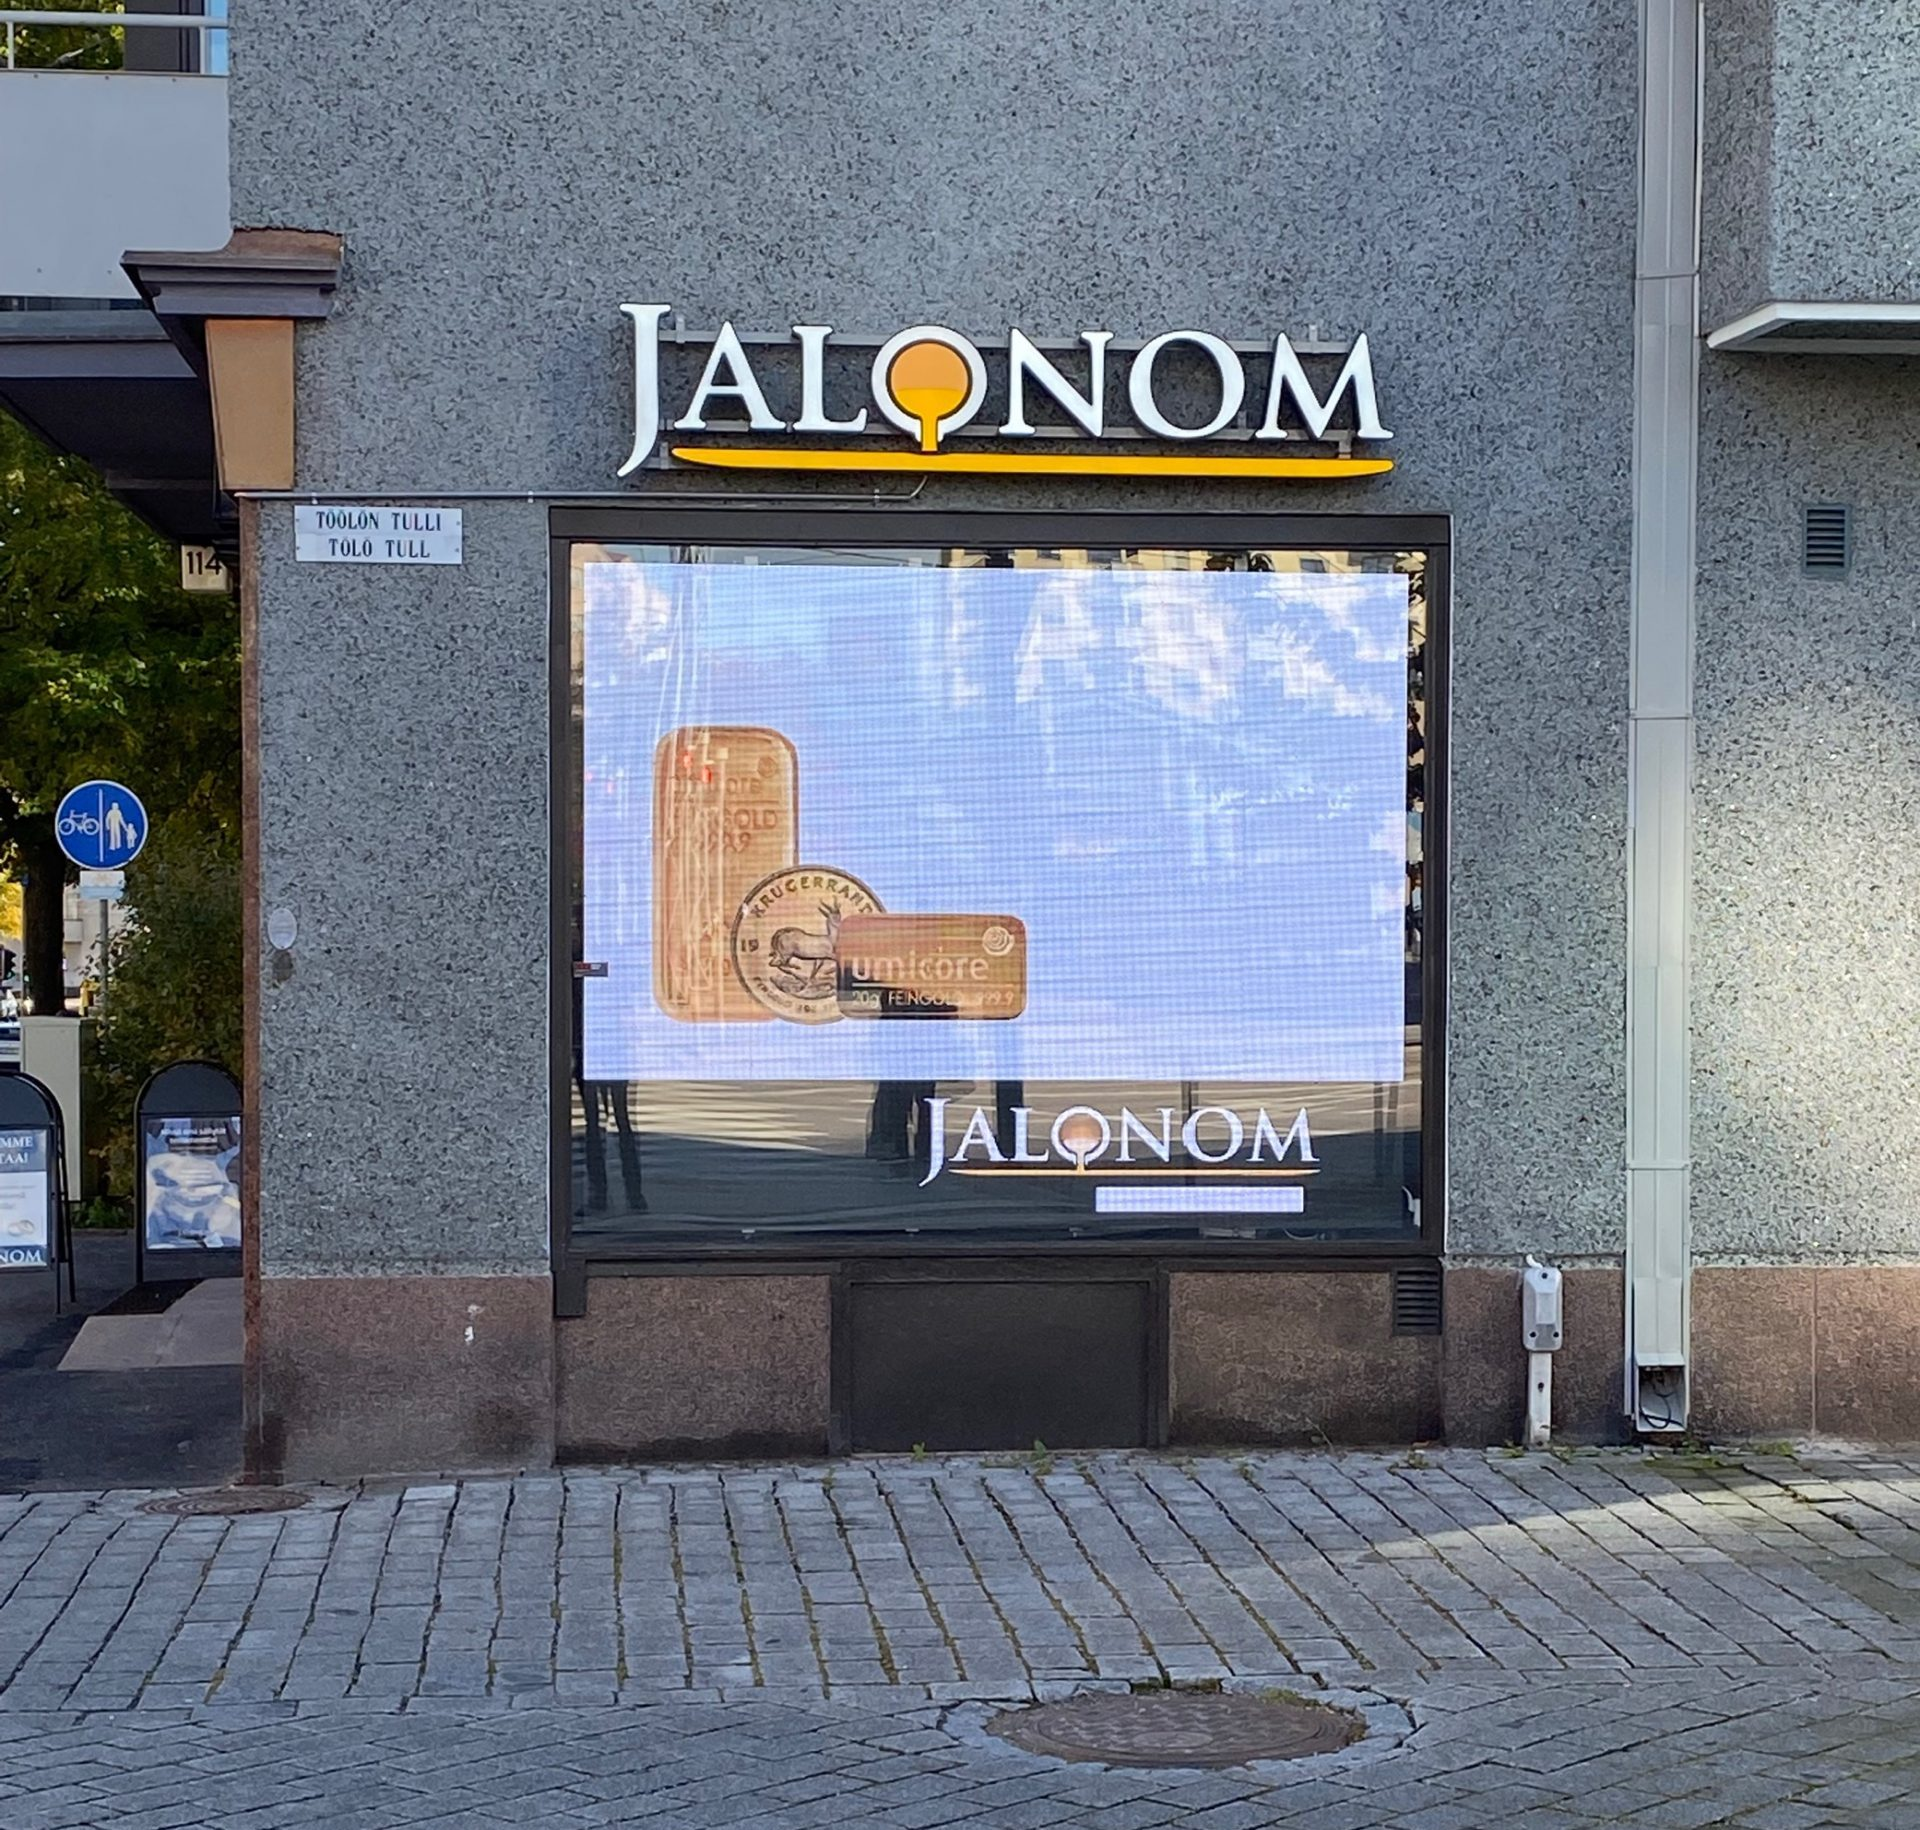 Helsinki: Mannerheimintie